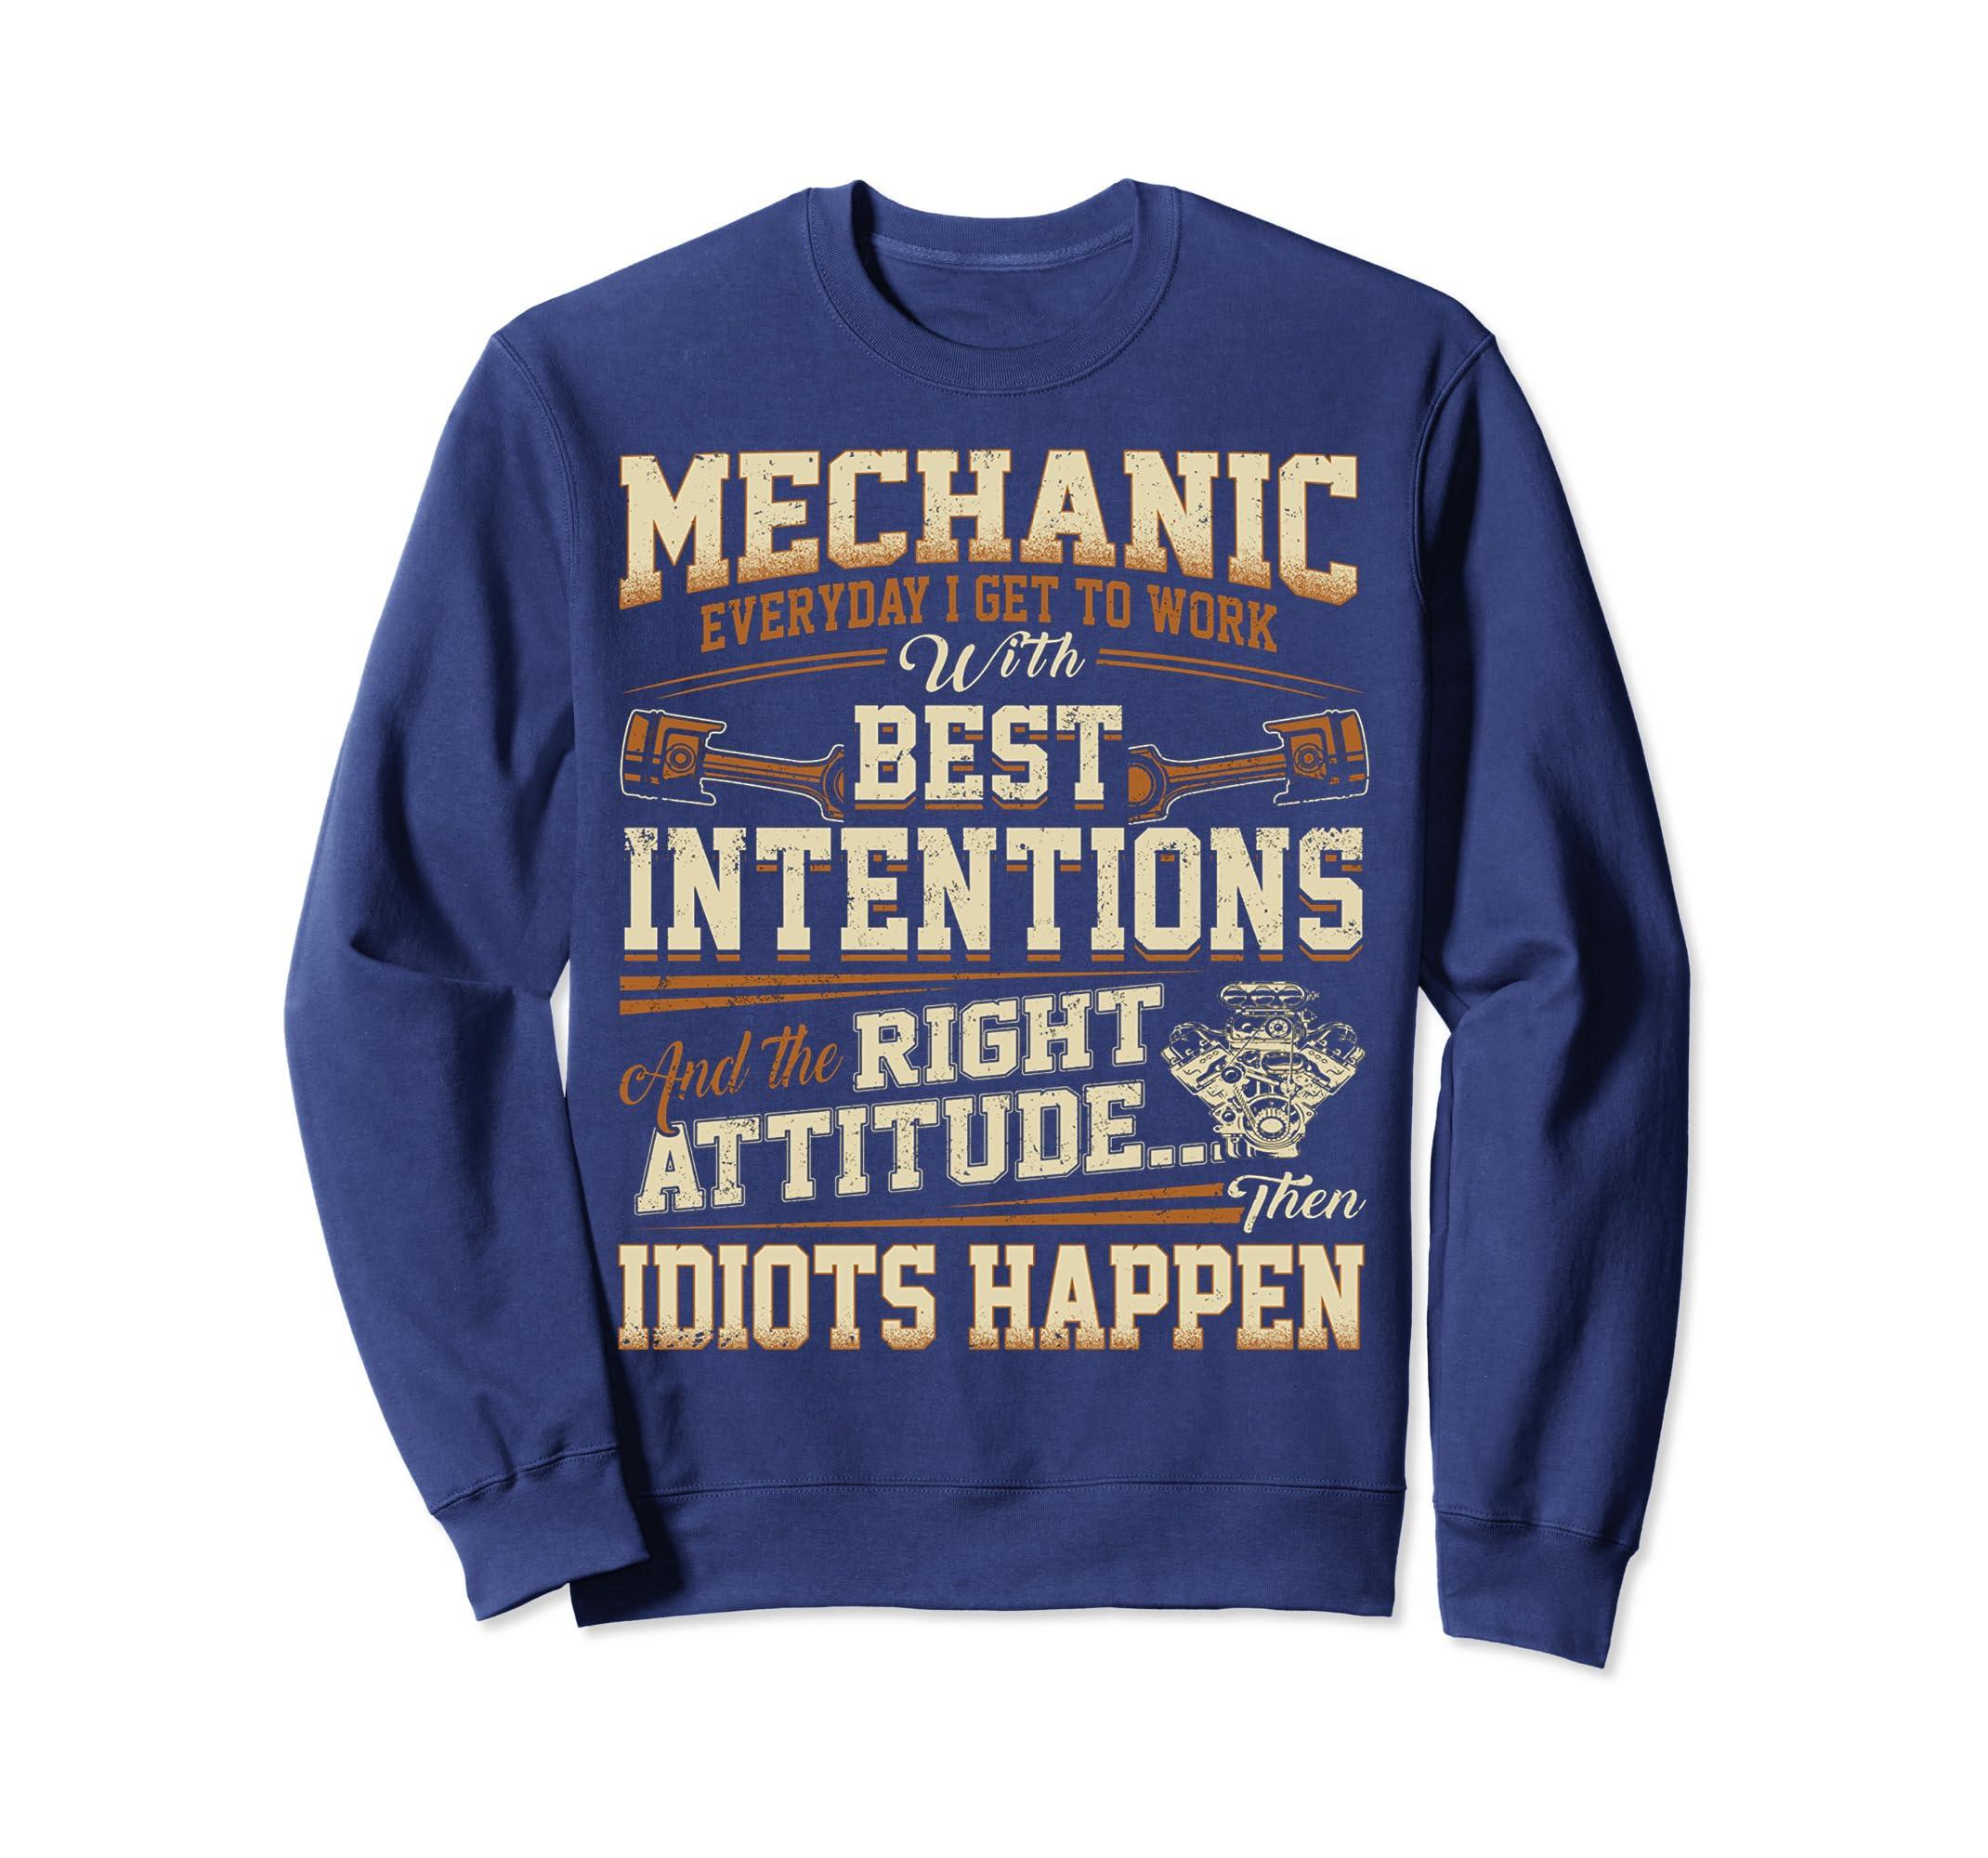 60da48e727ca Amazon.com: Mechanic Everyday Sweatshirt and tee: Clothing